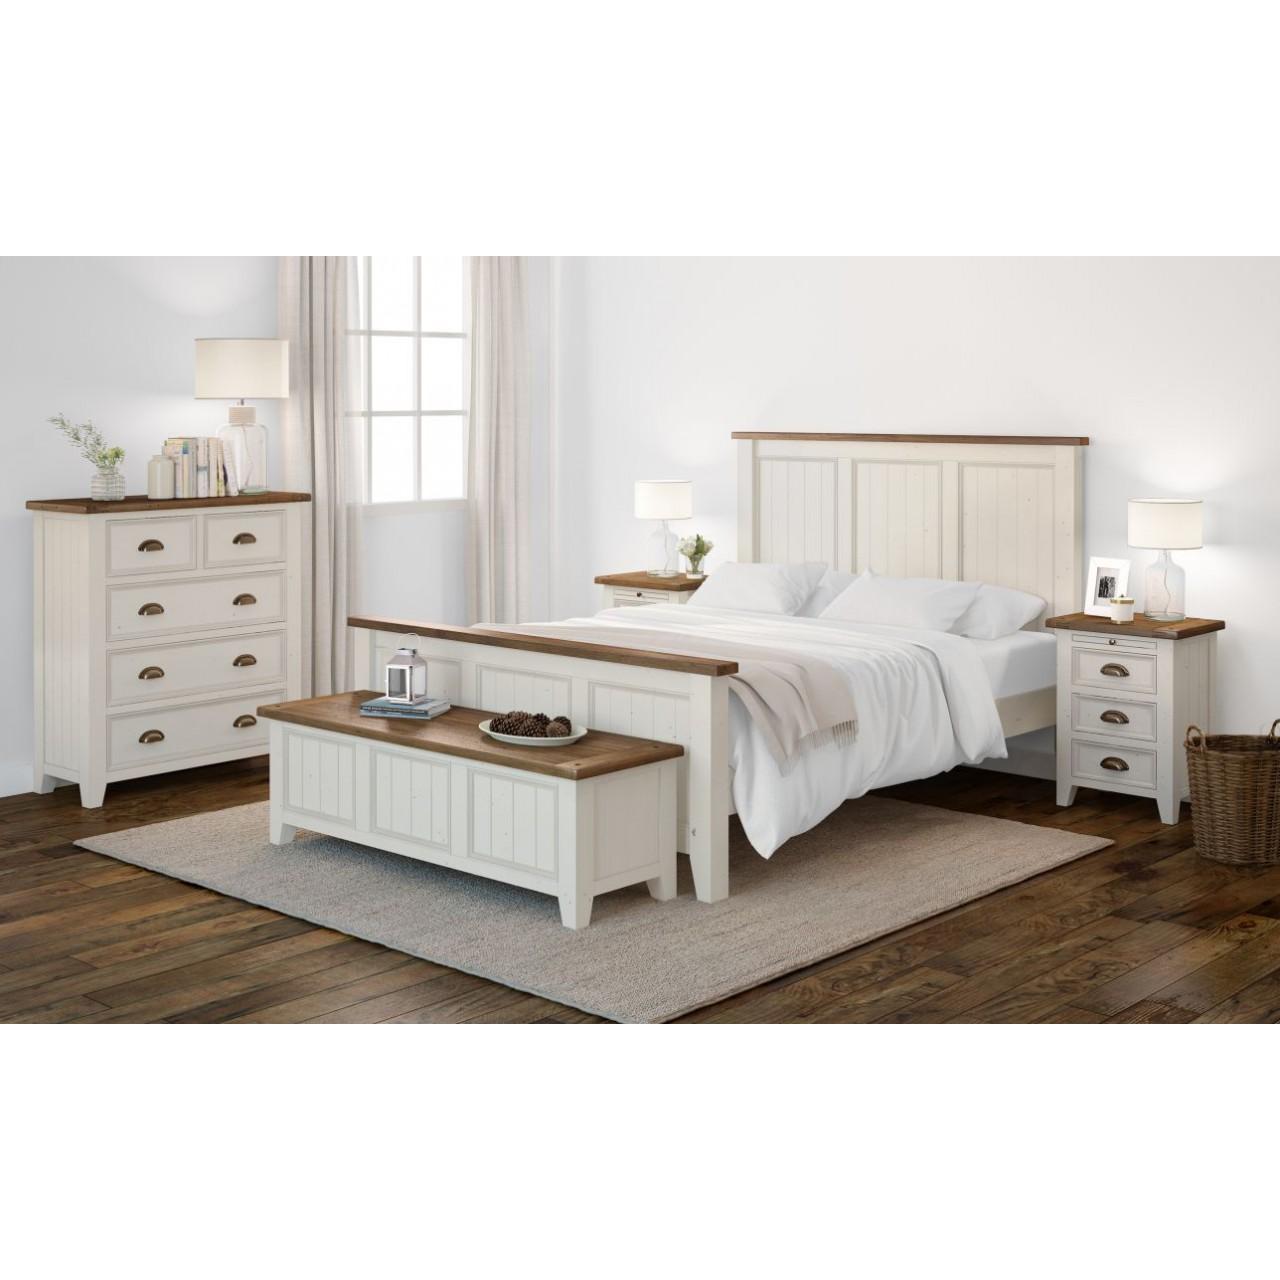 Tigress Direct Furniture And Homewares